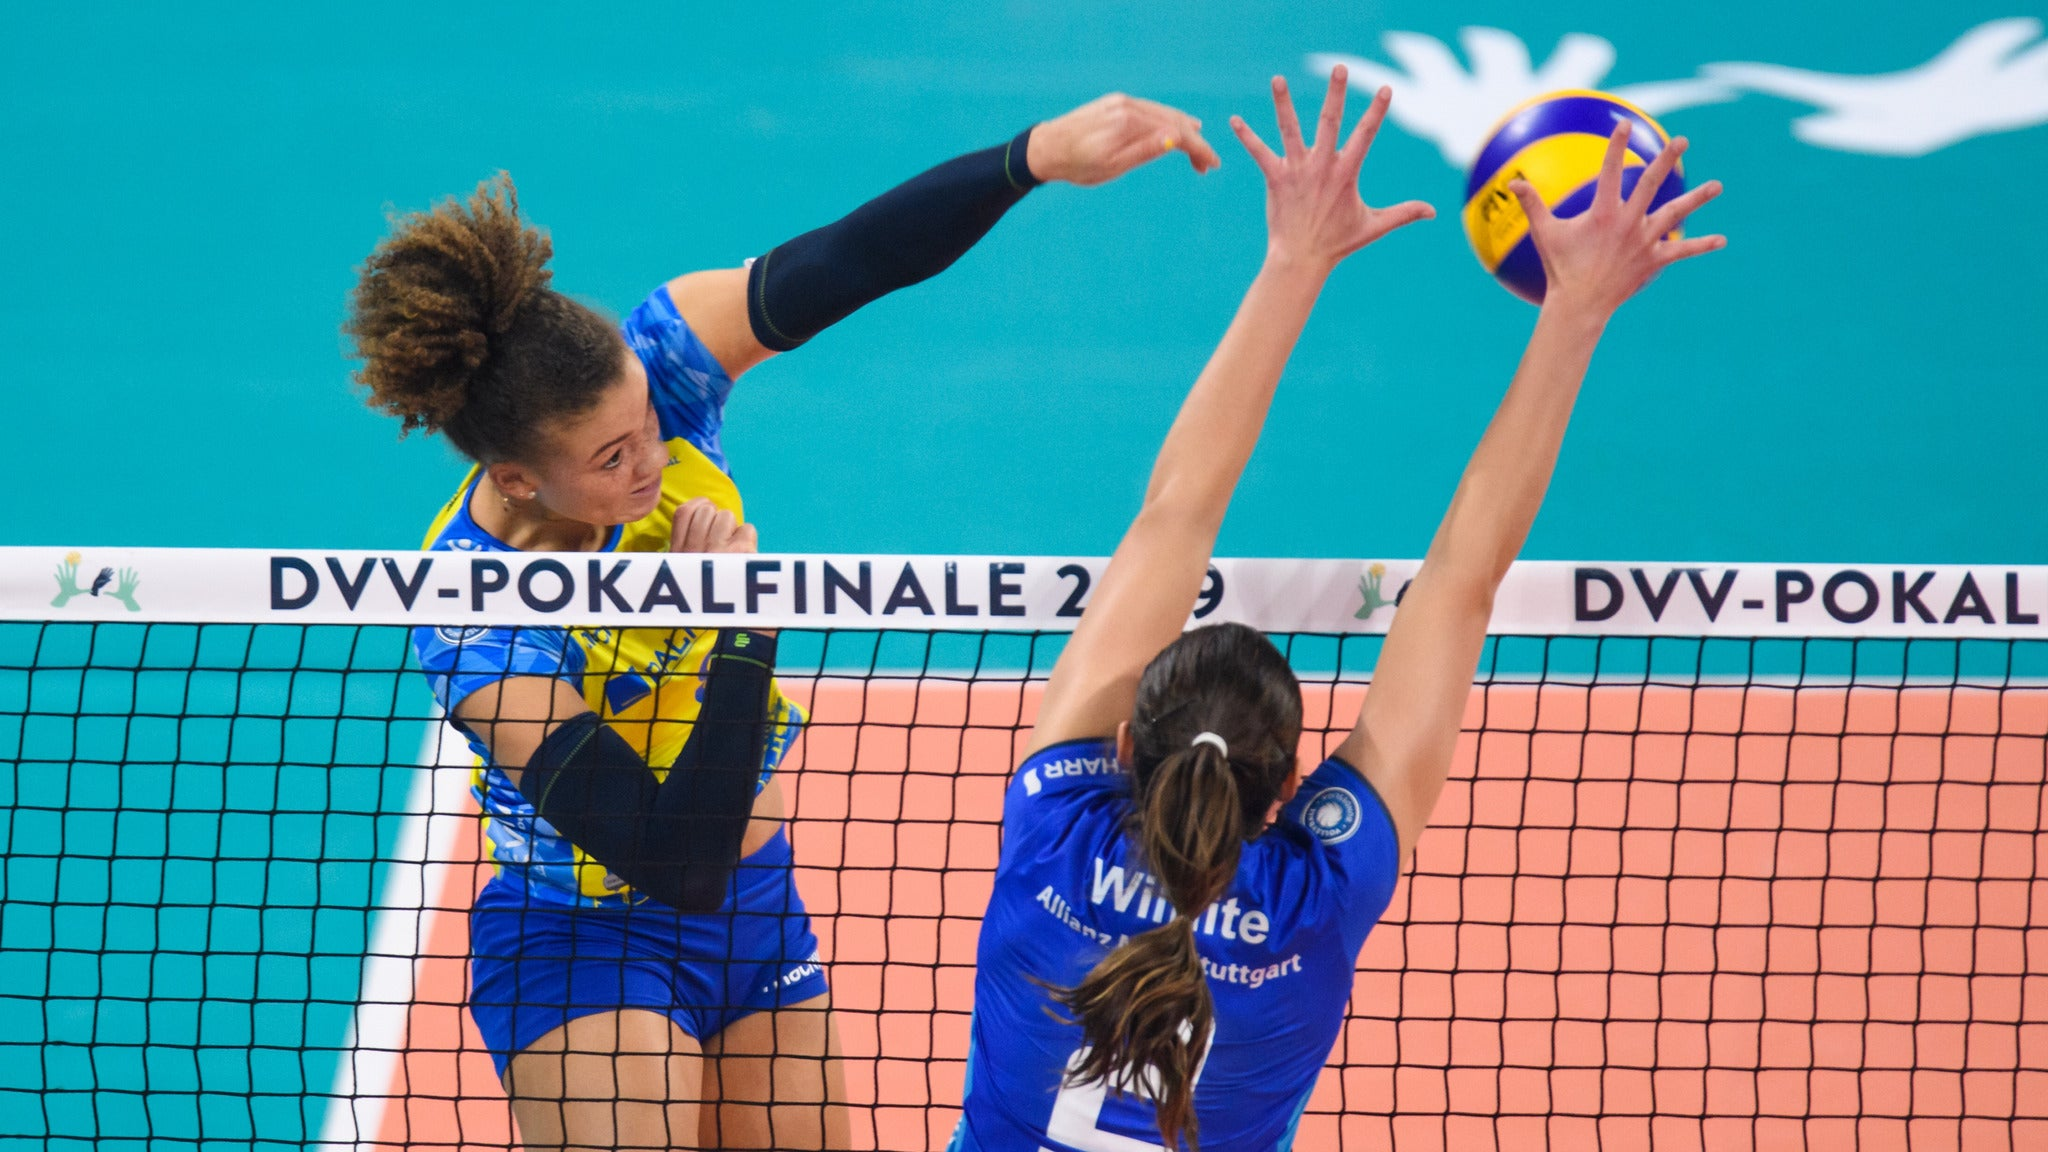 Volleyball DVV-Pokalfinale